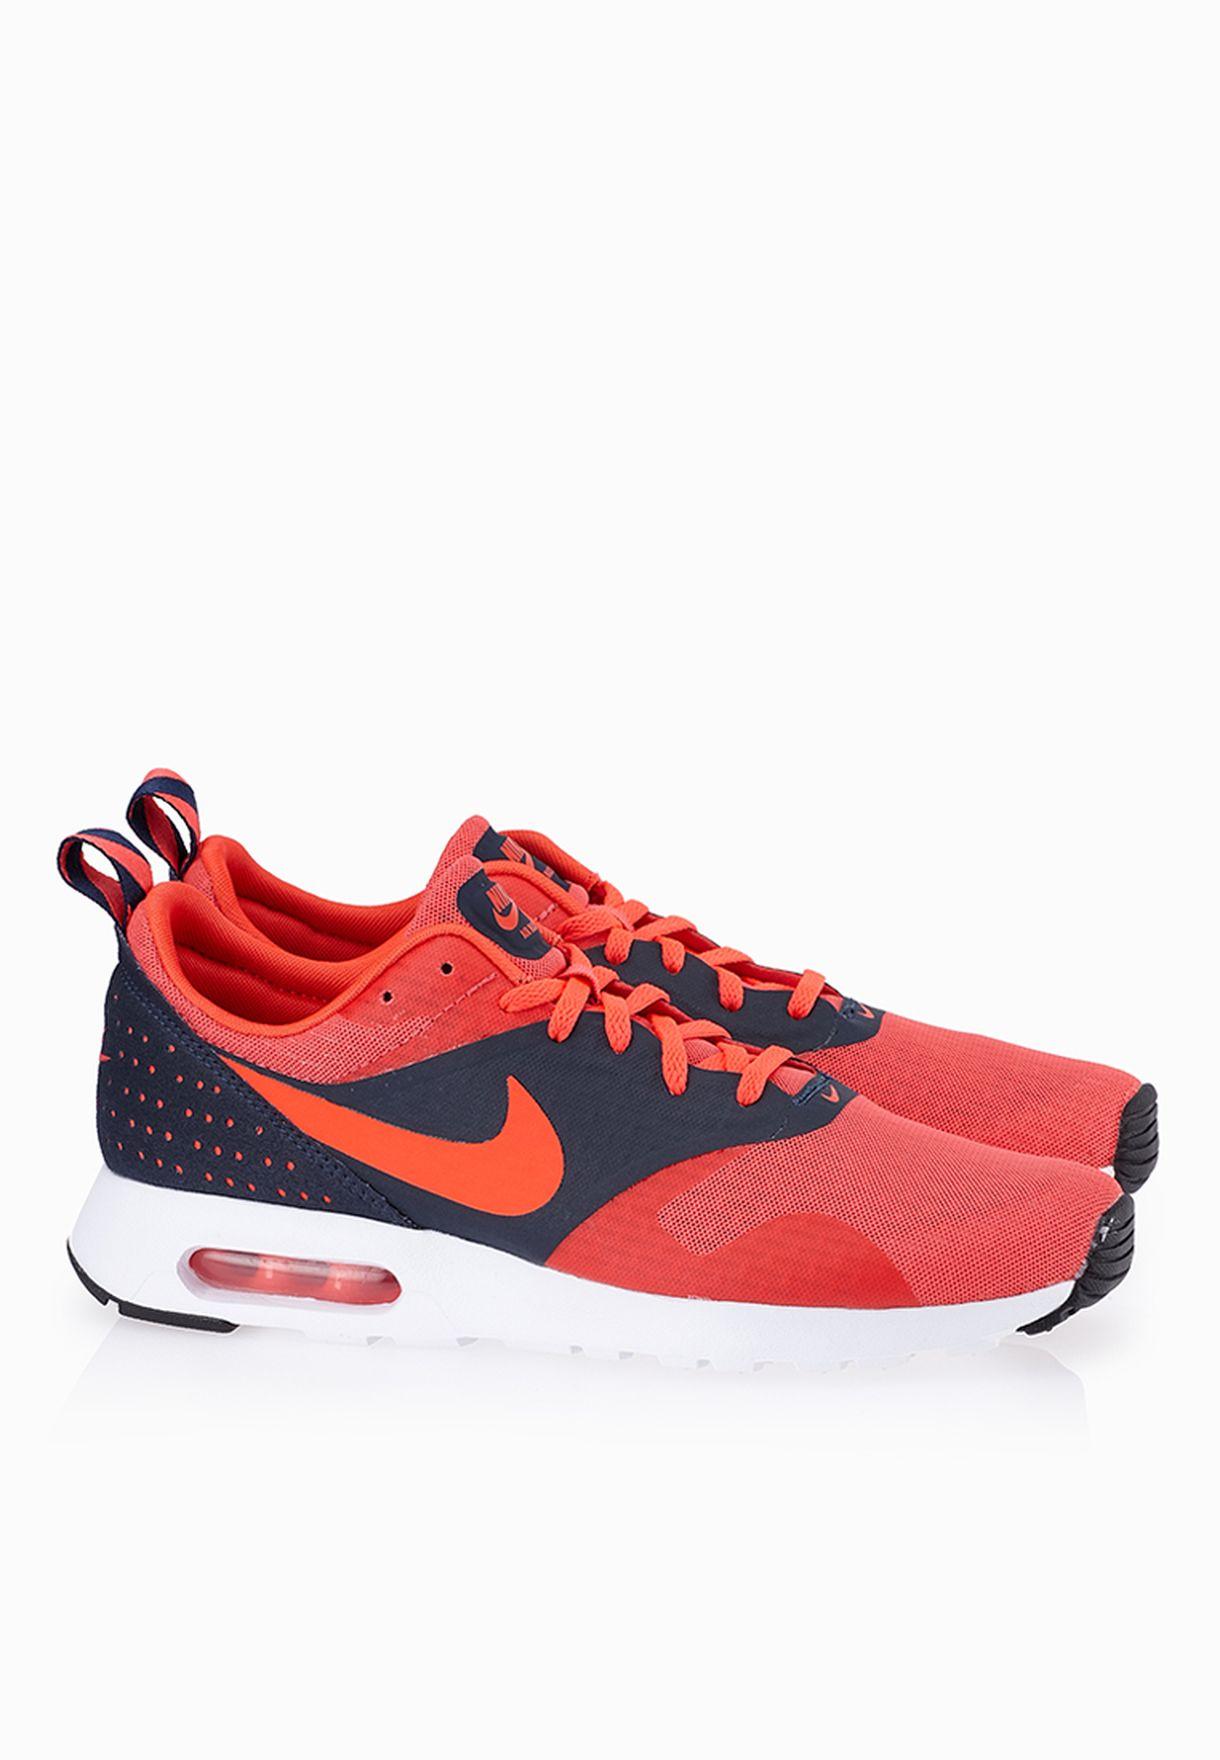 632ee0379a Shop Nike red Air Max Tavas Essential 725073-600 for Men in Qatar ...